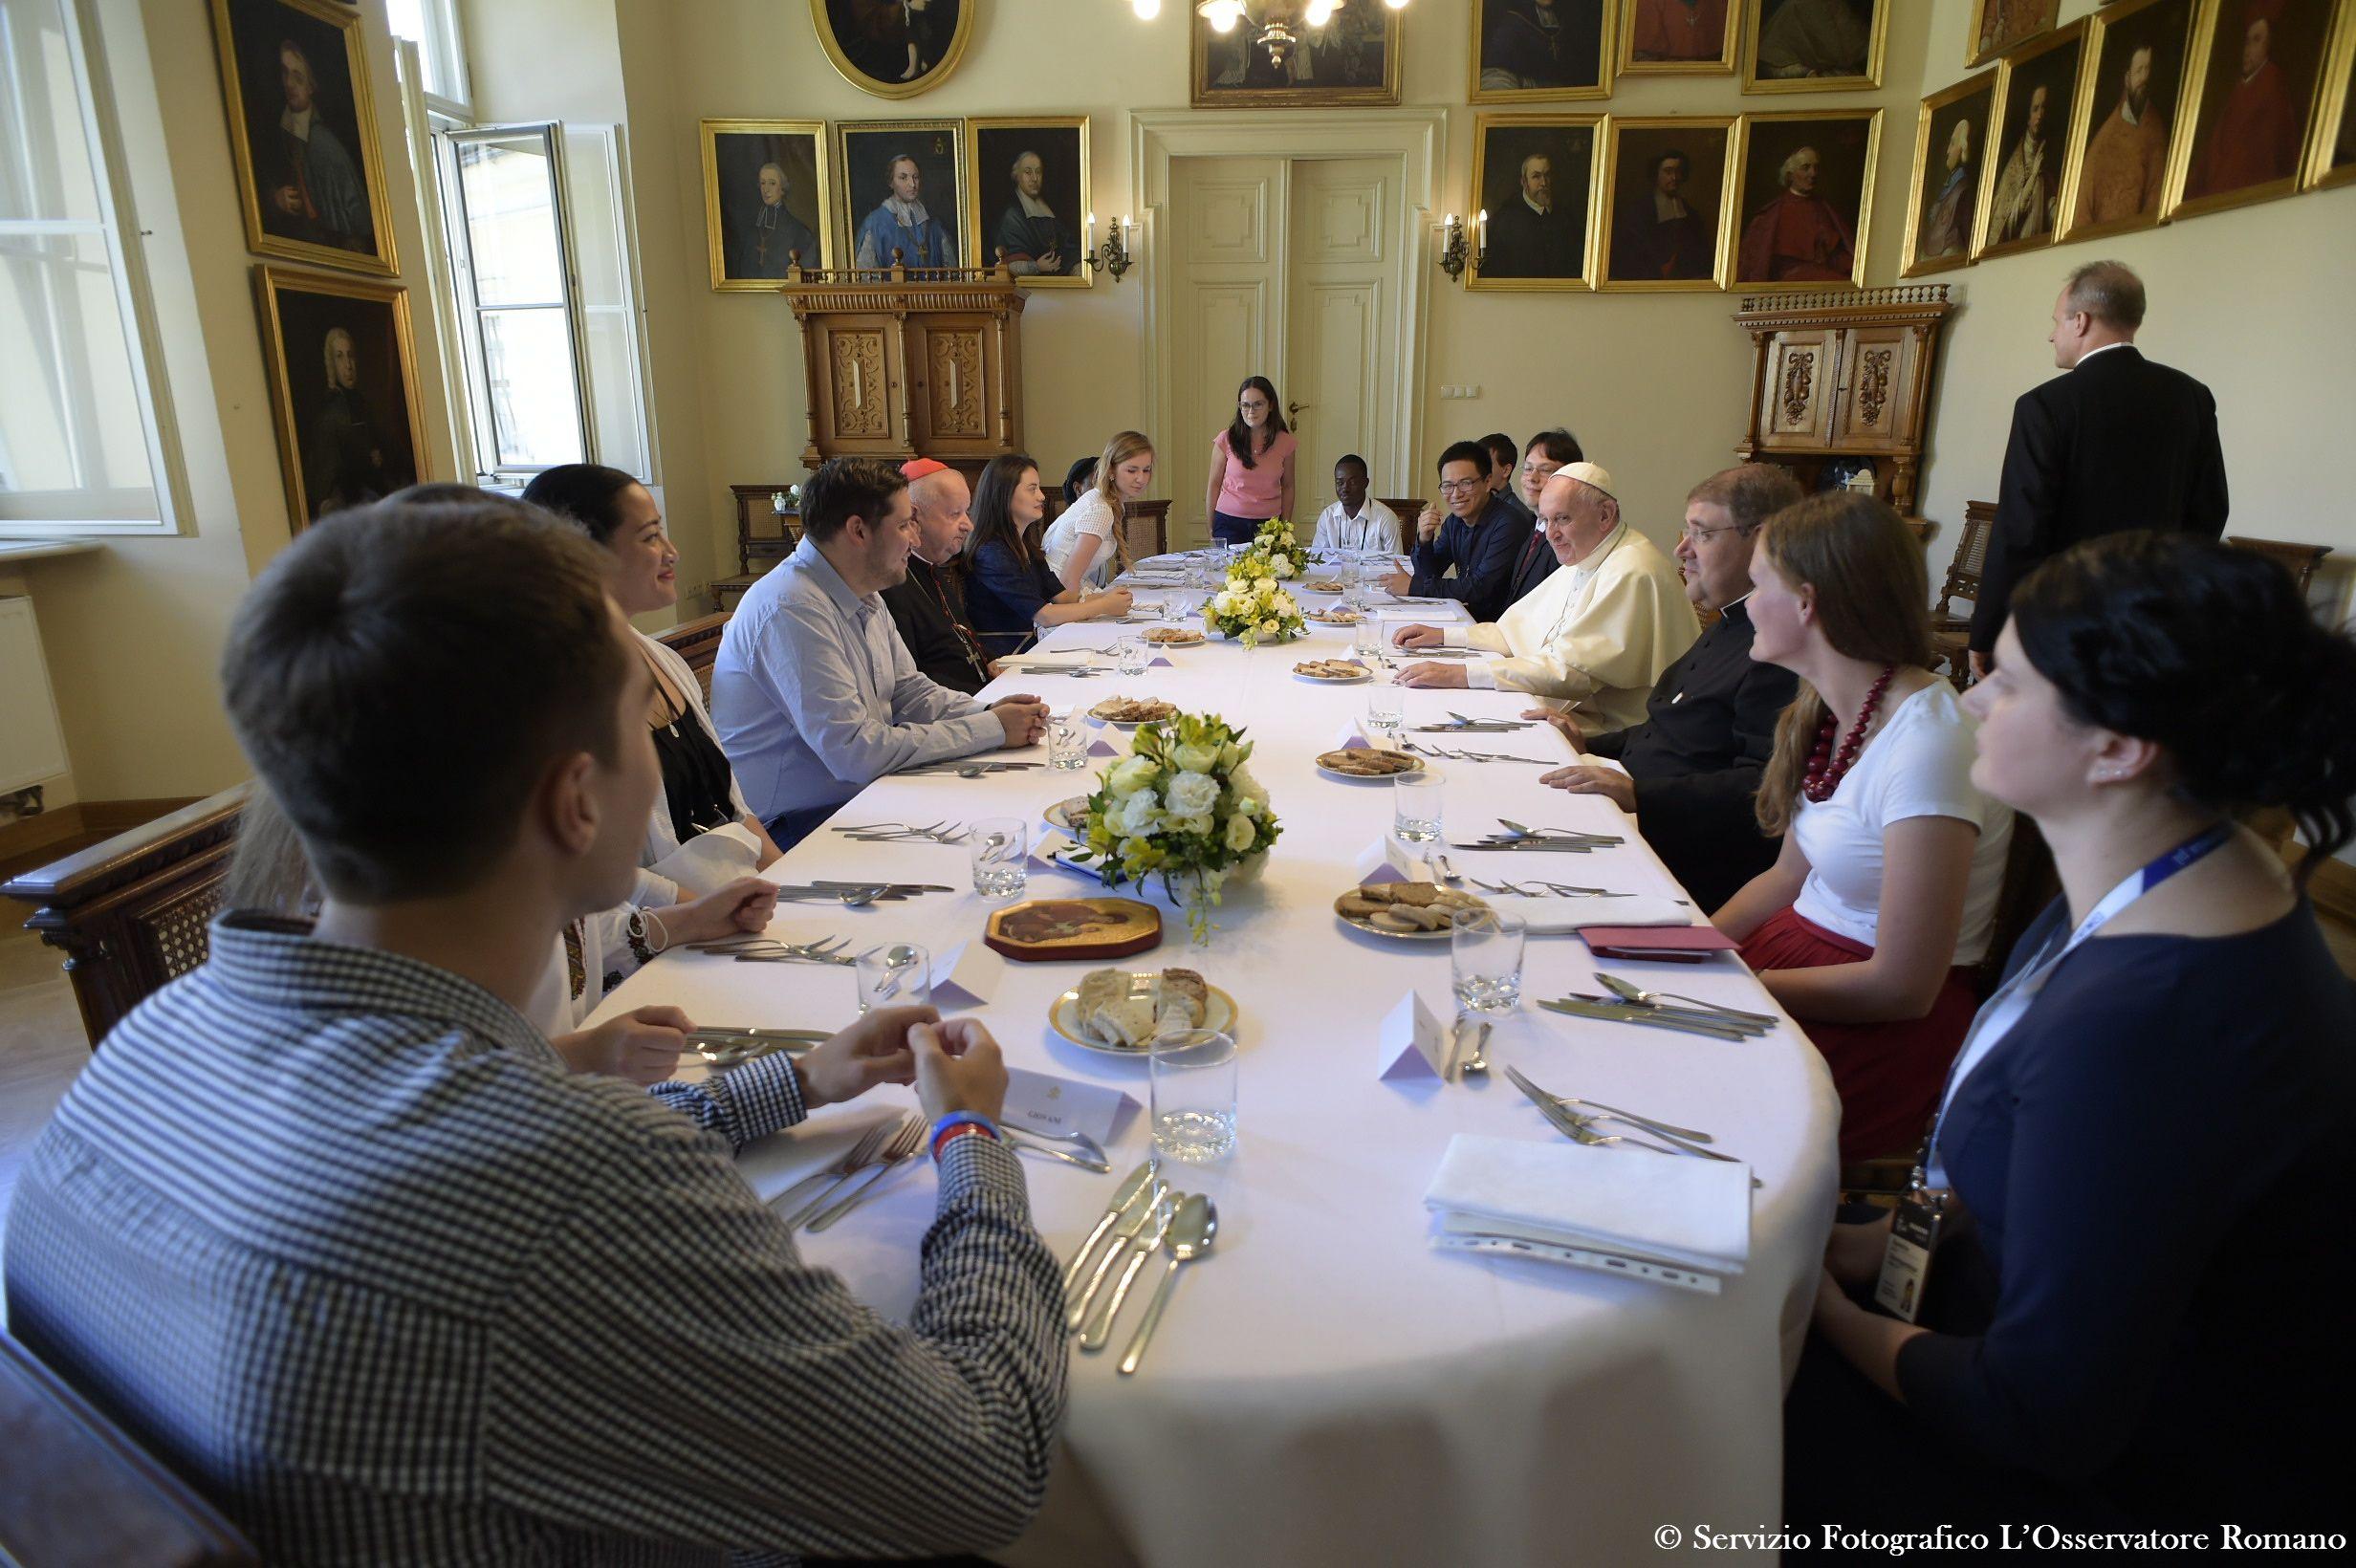 El Papa almuerza con un grupo de jóvenes de la JMJ de Cracovia (Oss. Romano © Photo.va) 30-07-2016 @Servizio Fotografico - L'Osservatore Romano